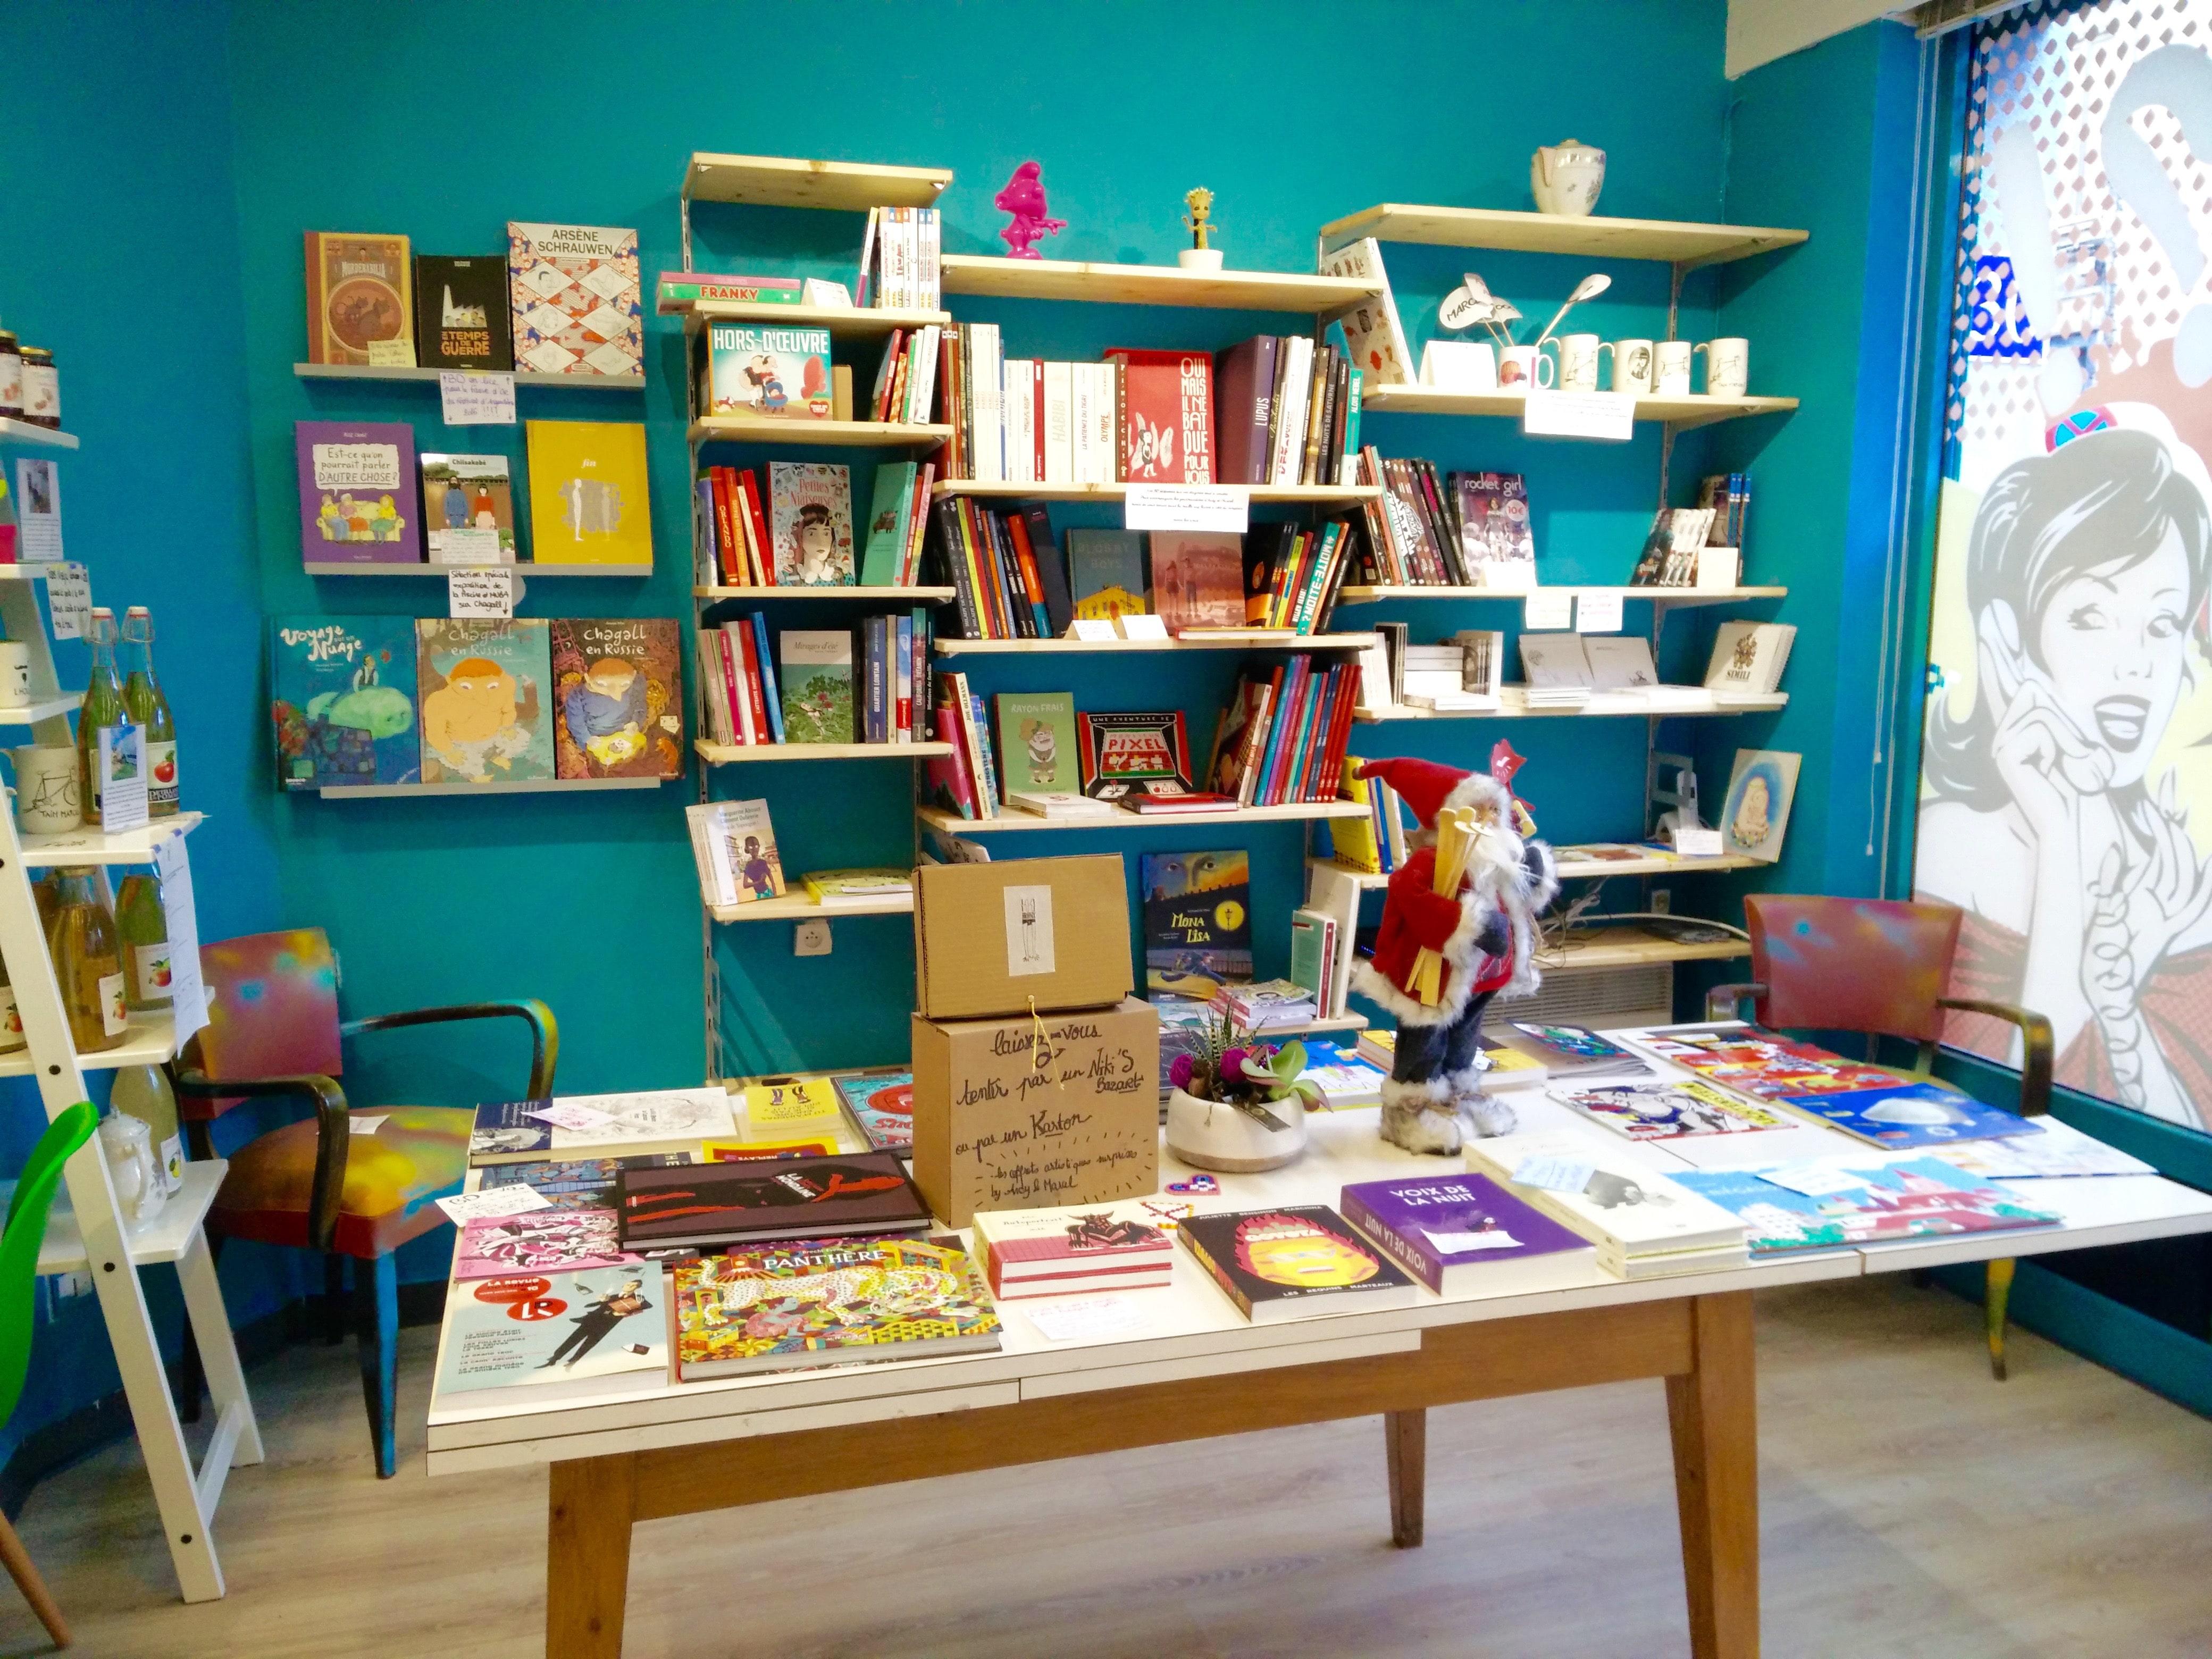 Andy marcel librairie bd salon de th lille chicon - Salon de the librairie ...